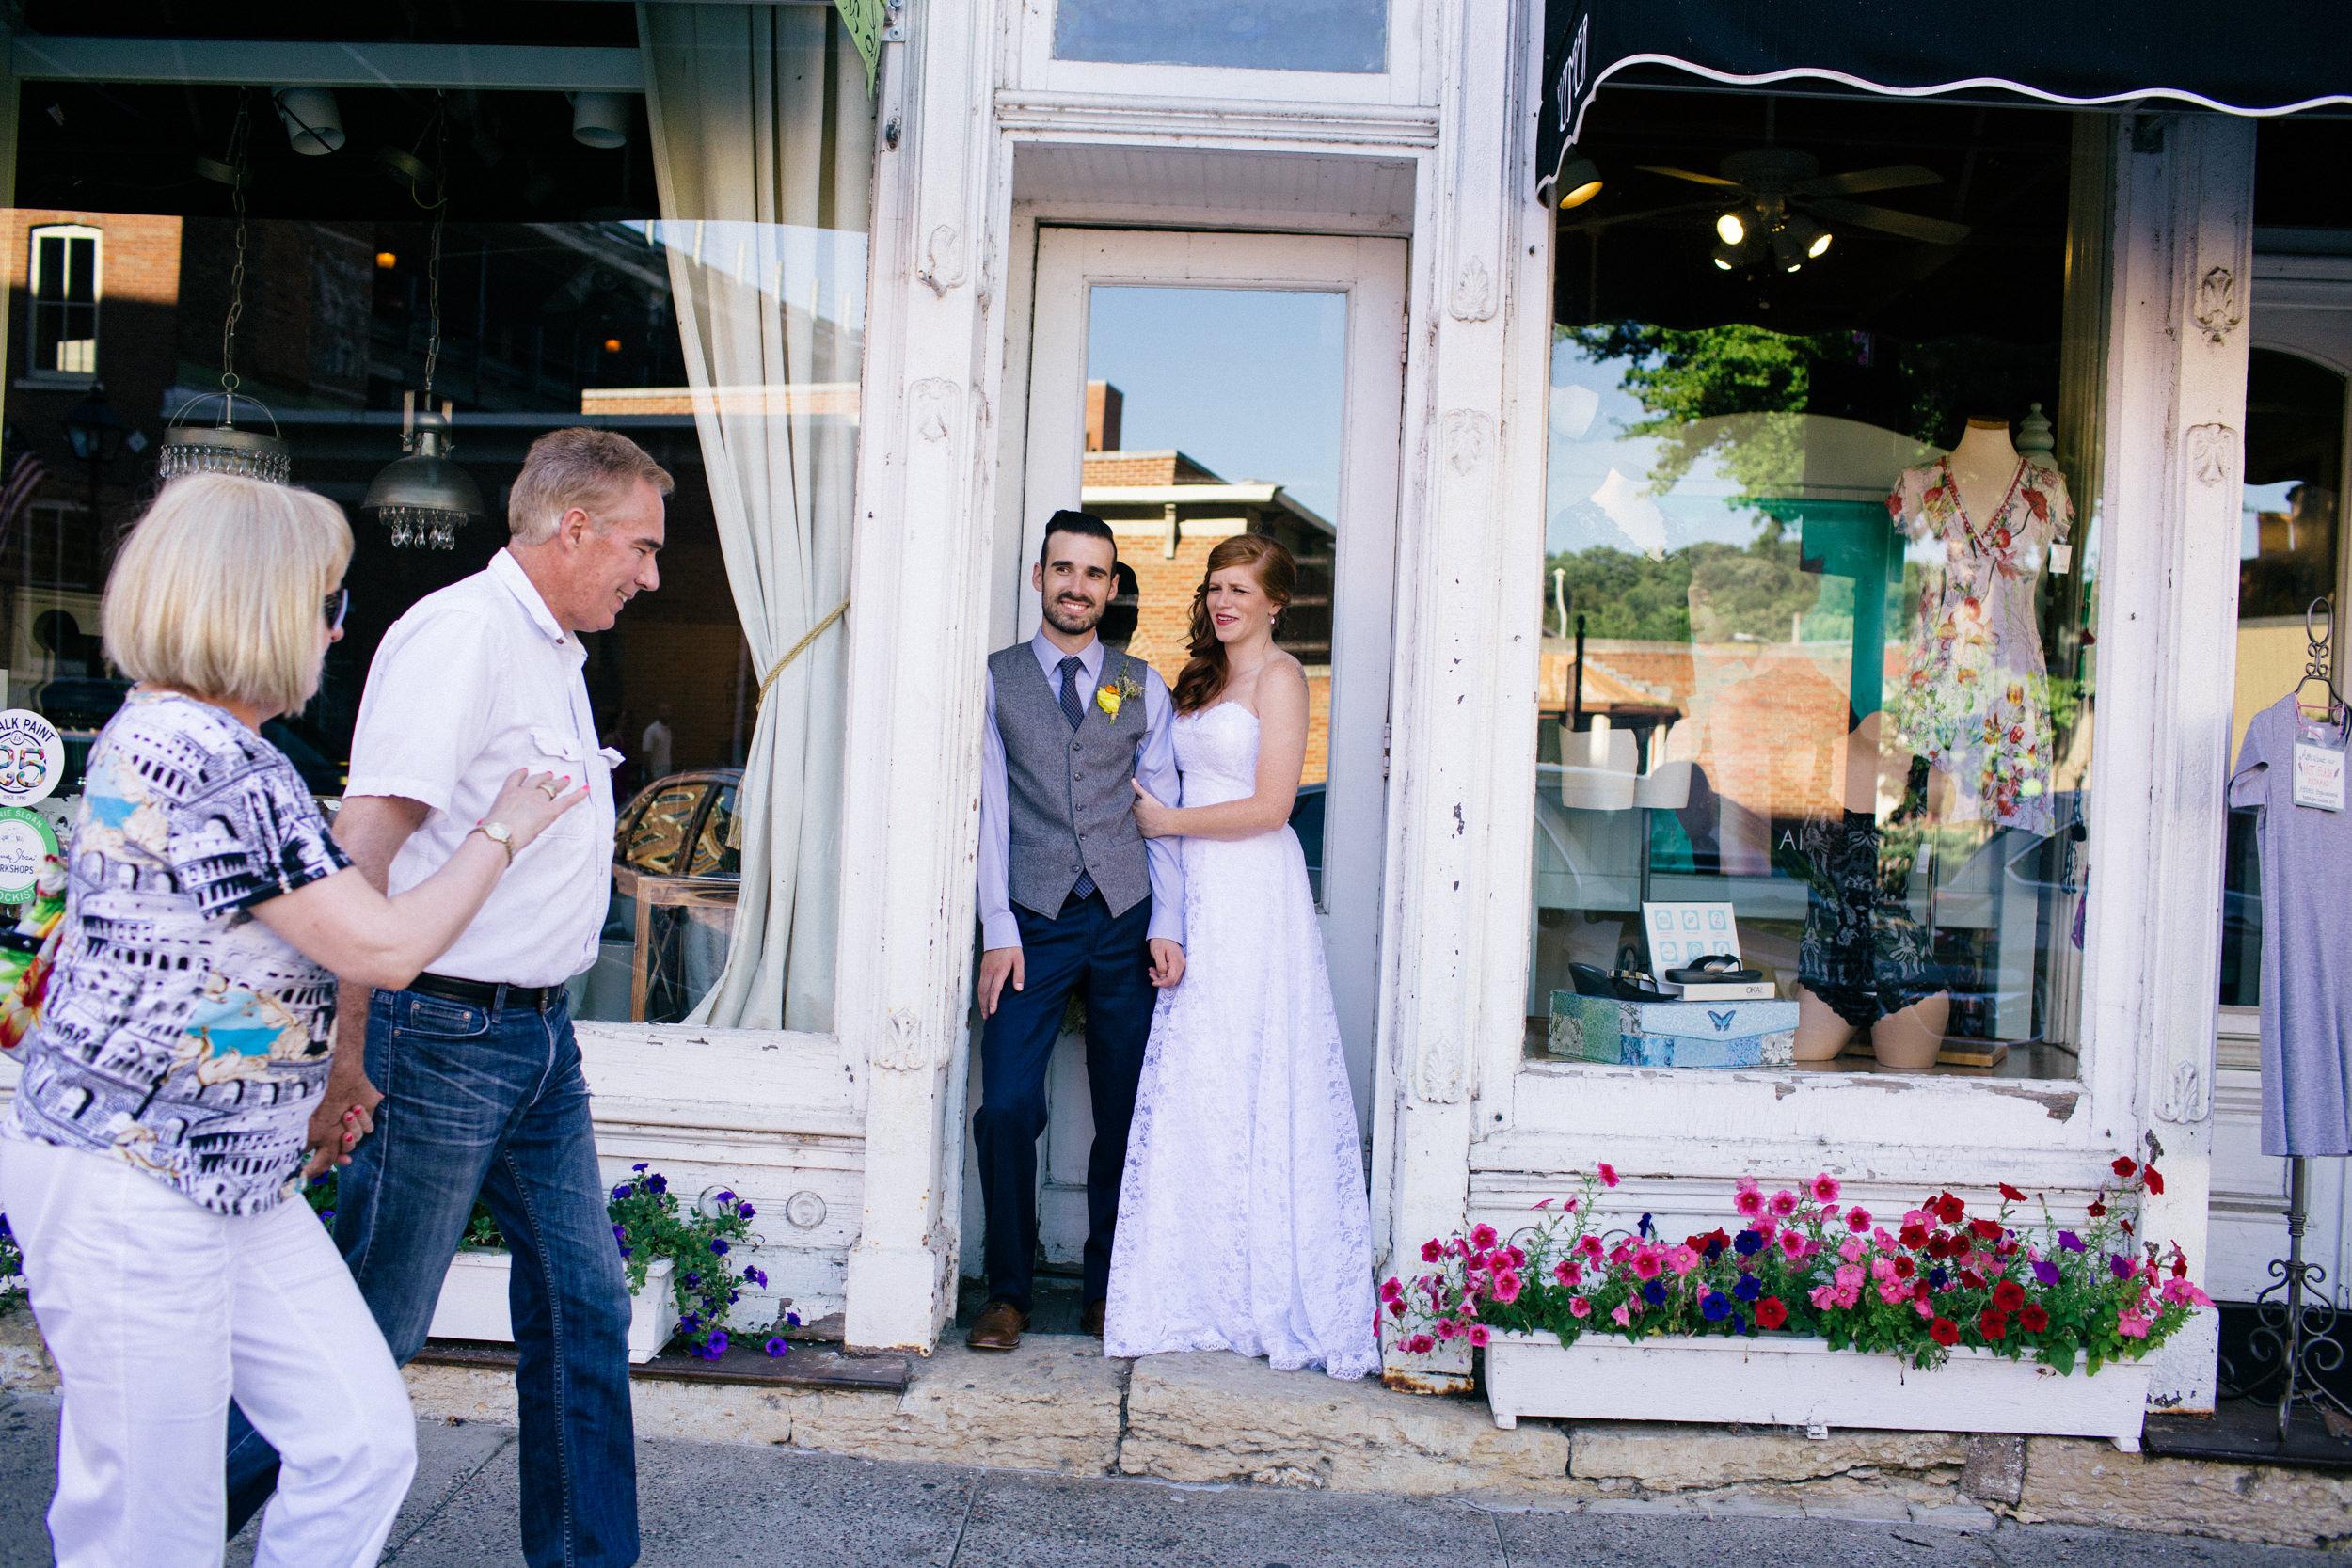 7-25-2015 Sarah and Jimmy's Eagle Ridge Downtown Galena Wedding-176.jpg